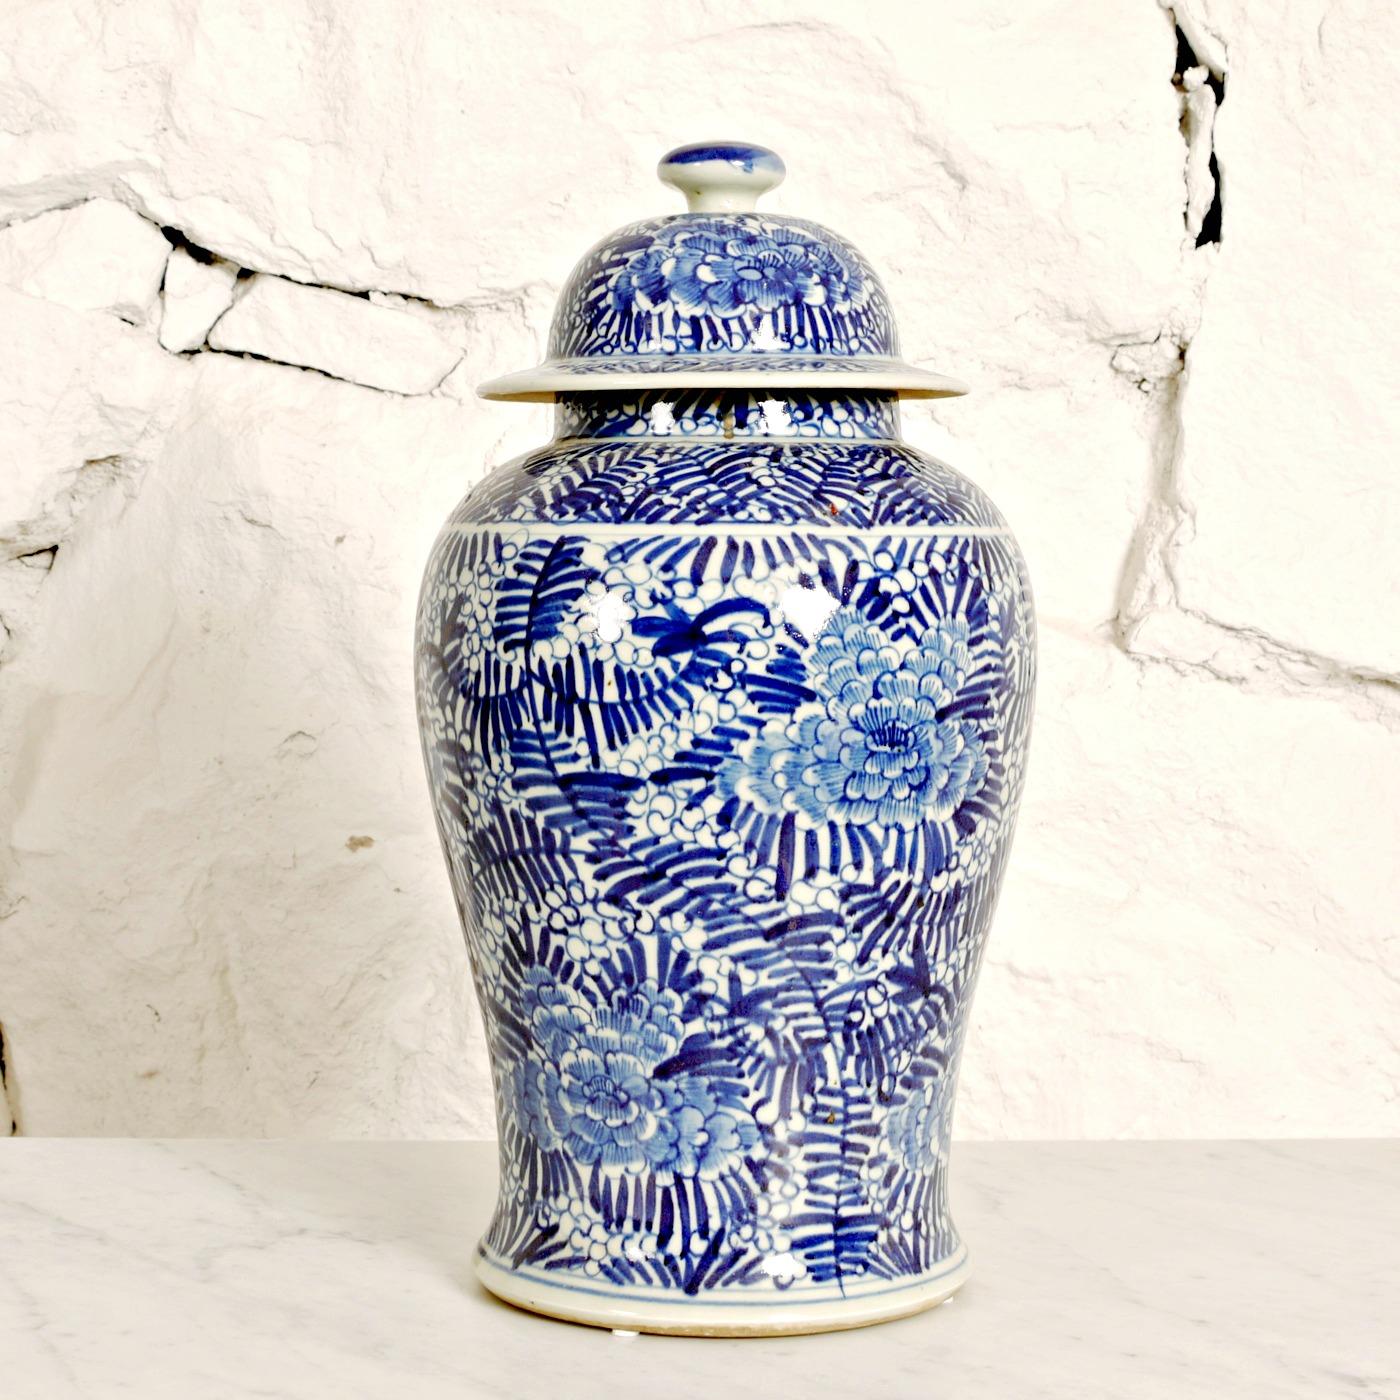 Stor urna, 43 cm. 2.400 SEK